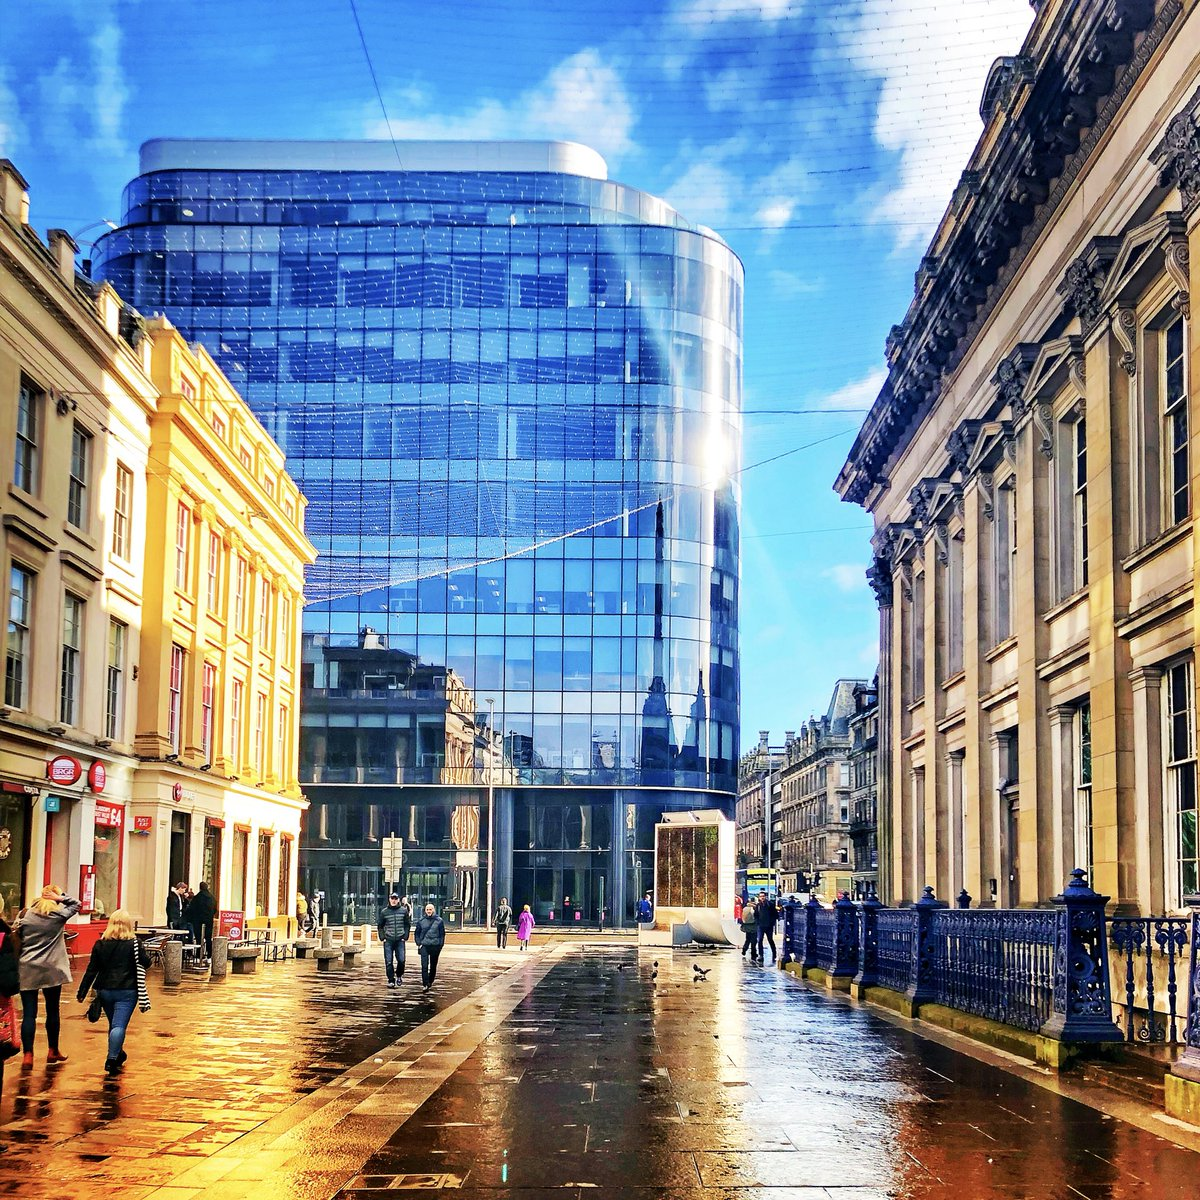 Reflections in Glasgow #Glasgow #streetphotography #reflections #city #Cityscapes #rain #photography #photohrapher @GlasgowWETodaypic.twitter.com/OQNRUHpg4G